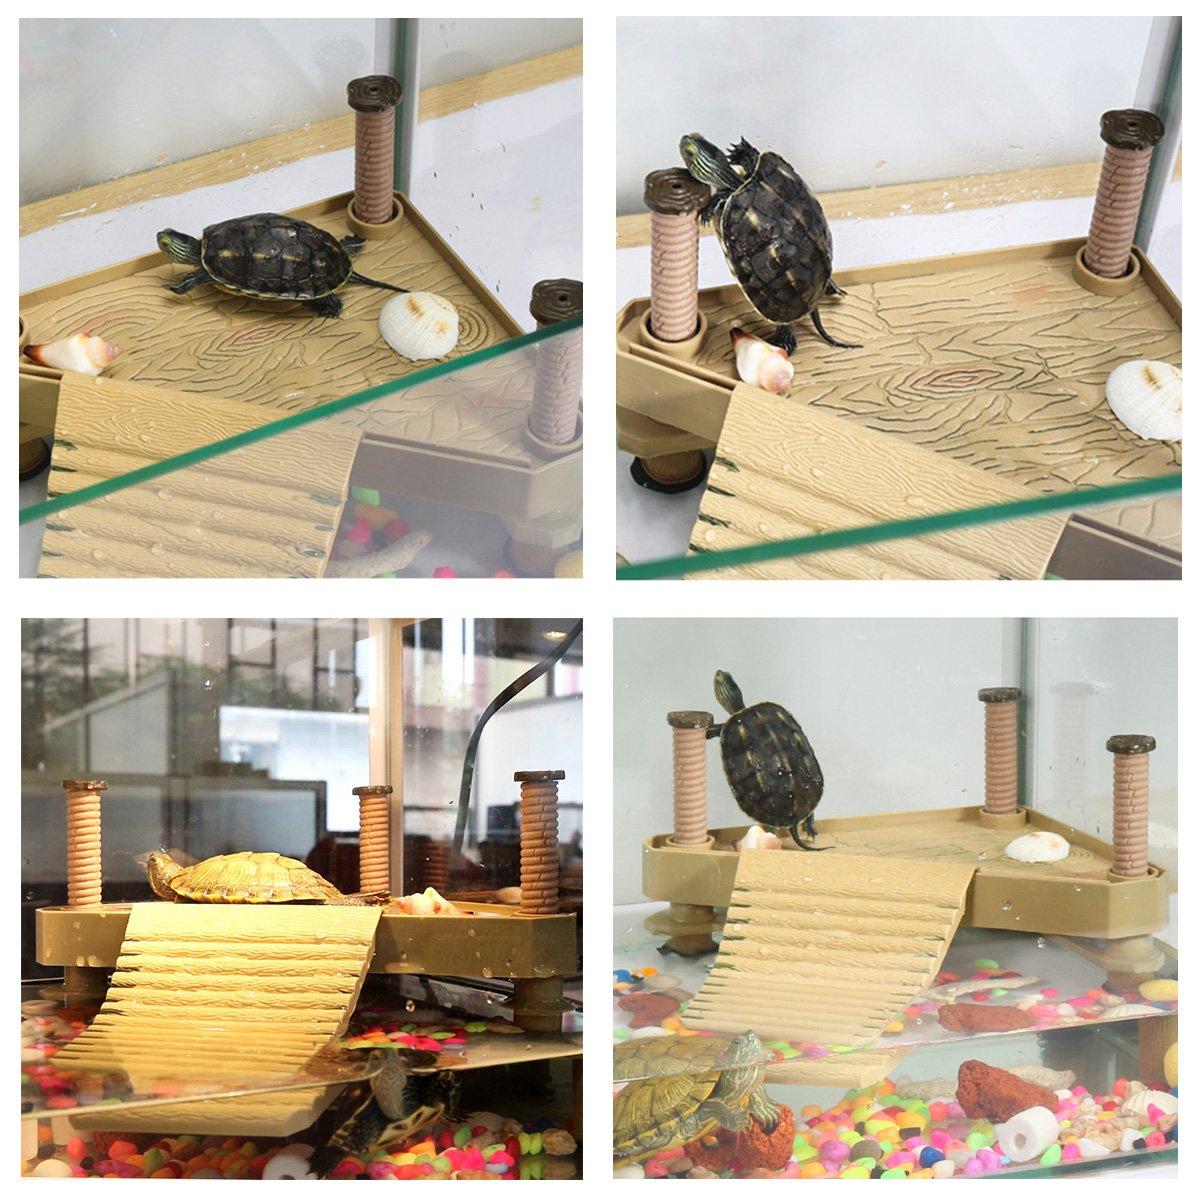 Amakunft Turtle Floating Basking Platform Terrapin Dock Frogs Reptile Ramp Pier with Ladder Aquarium Tank Accessory